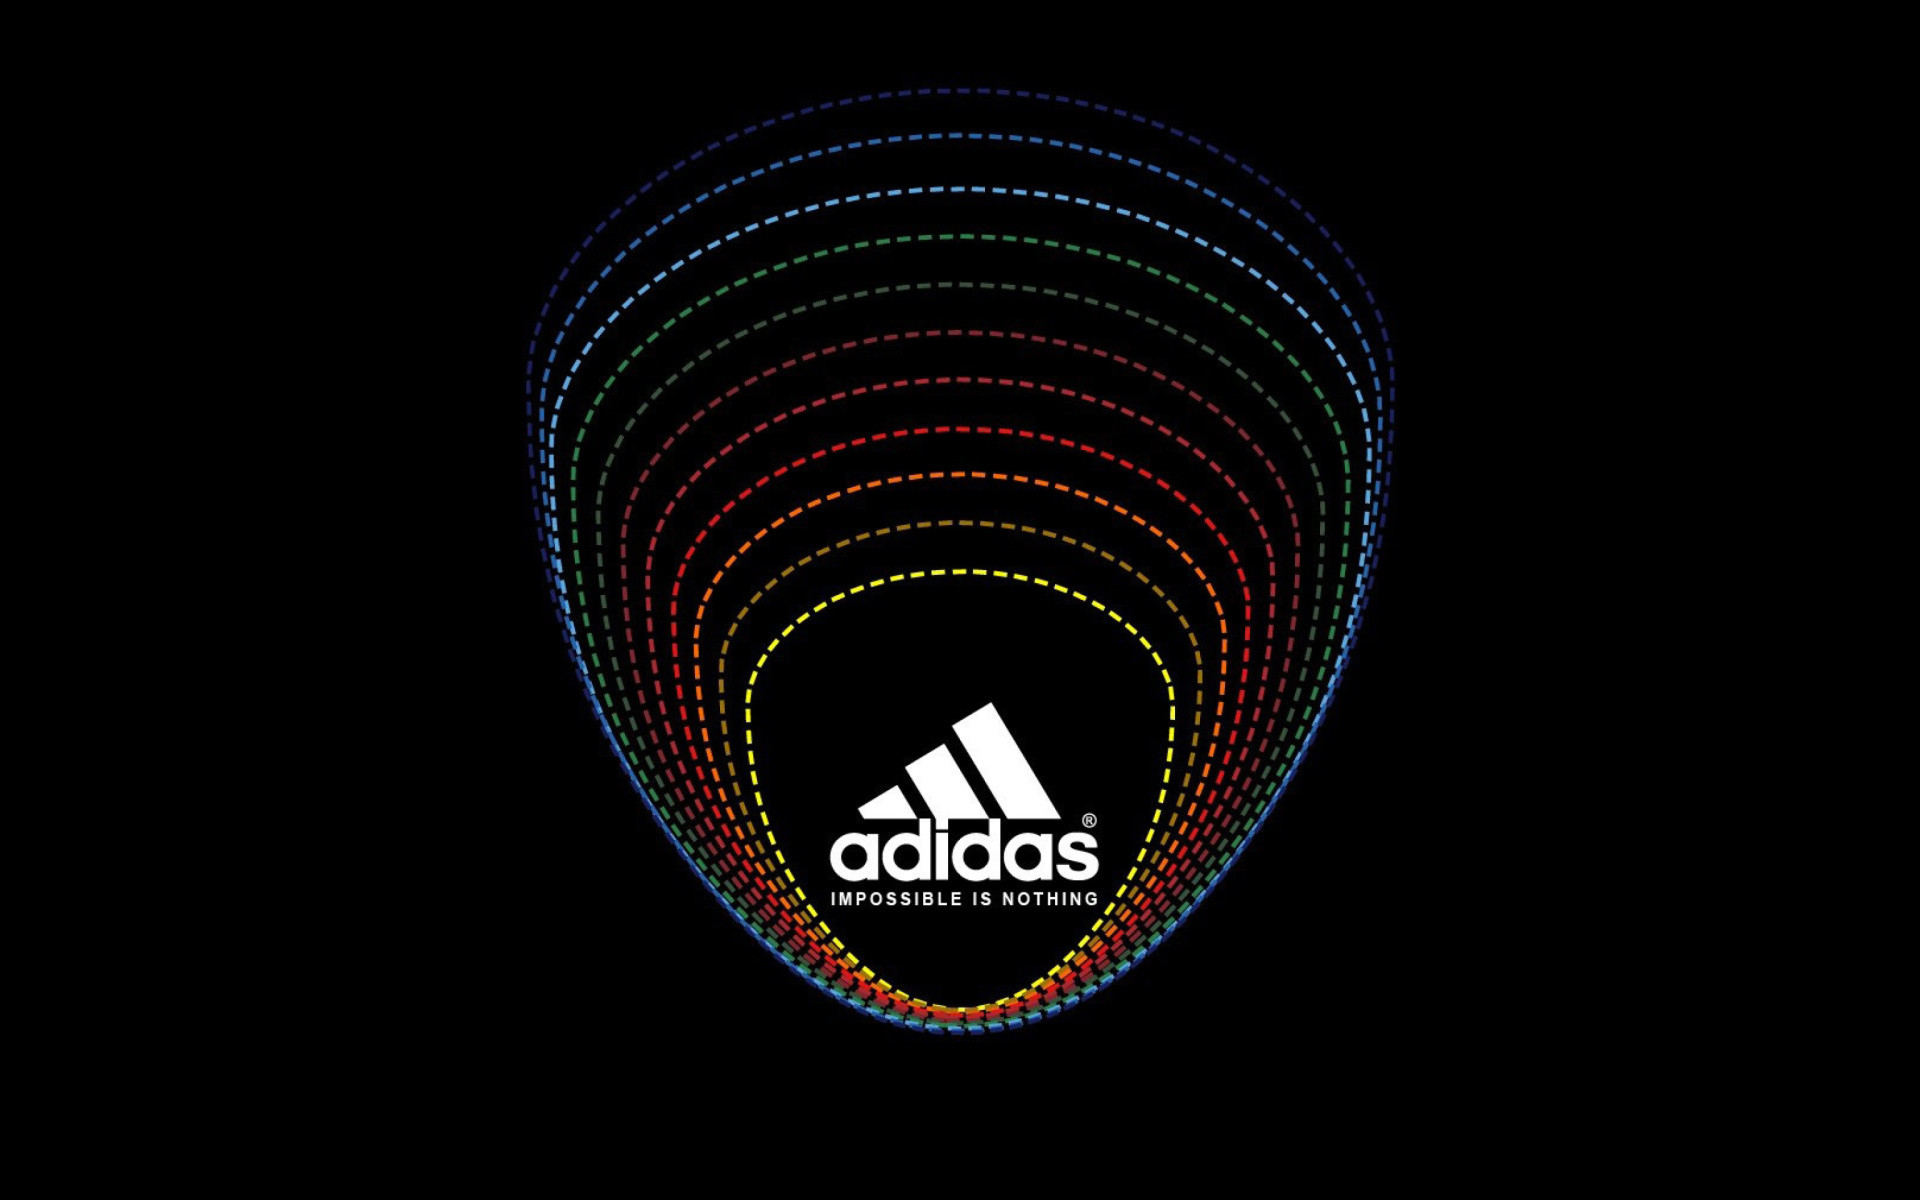 adidas nike wallpaper, nike adidas wallpaper